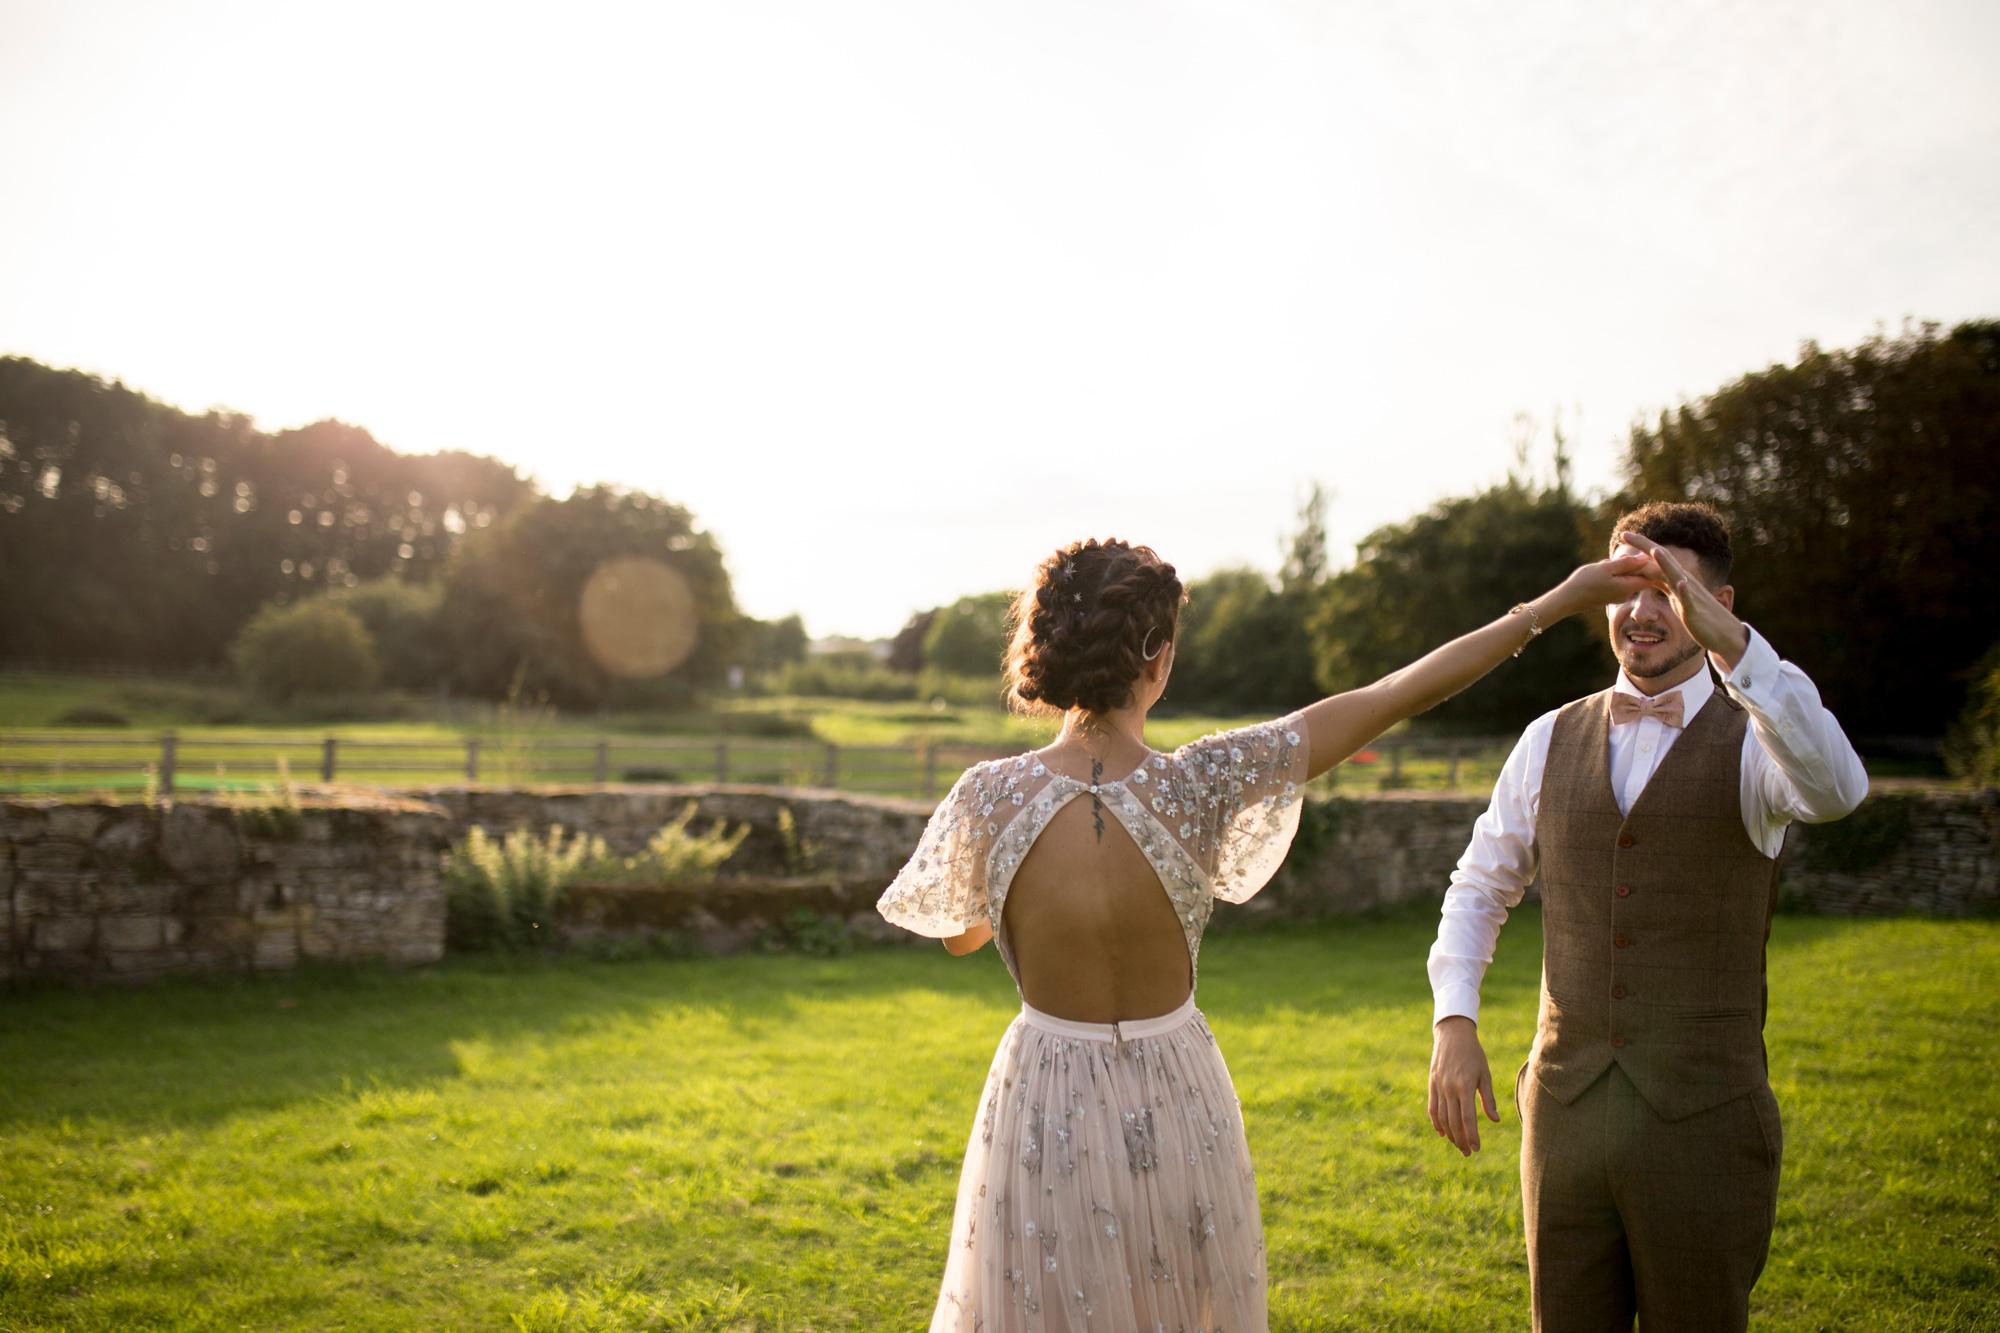 Couple, Sunset, Dancing, Needle and Thread, Bride, Groom,